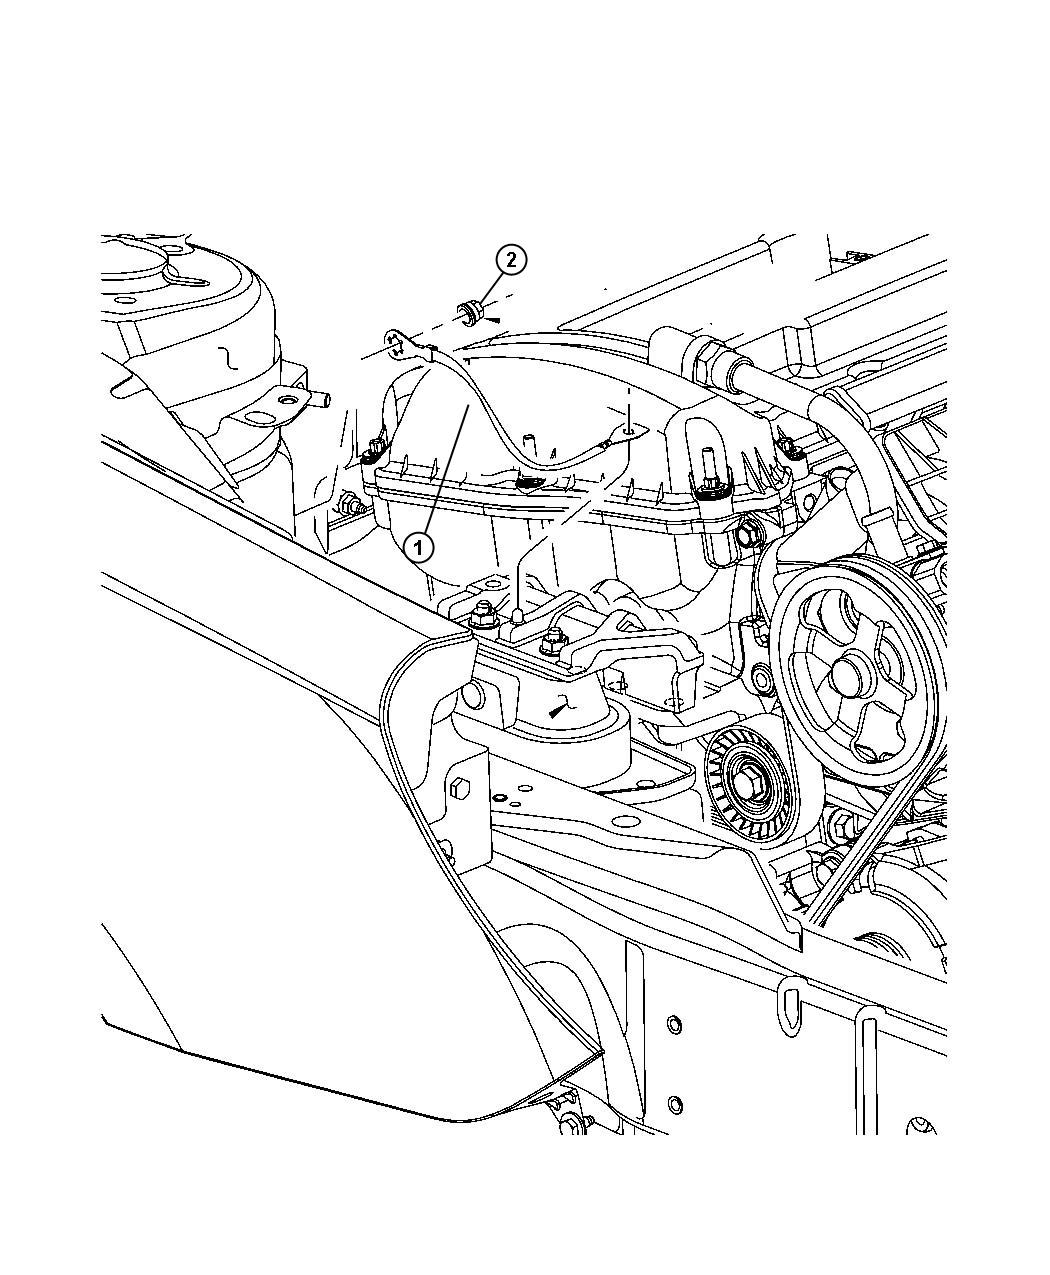 Dodge Avenger Strap Ground Engine Mount To Shock Tower